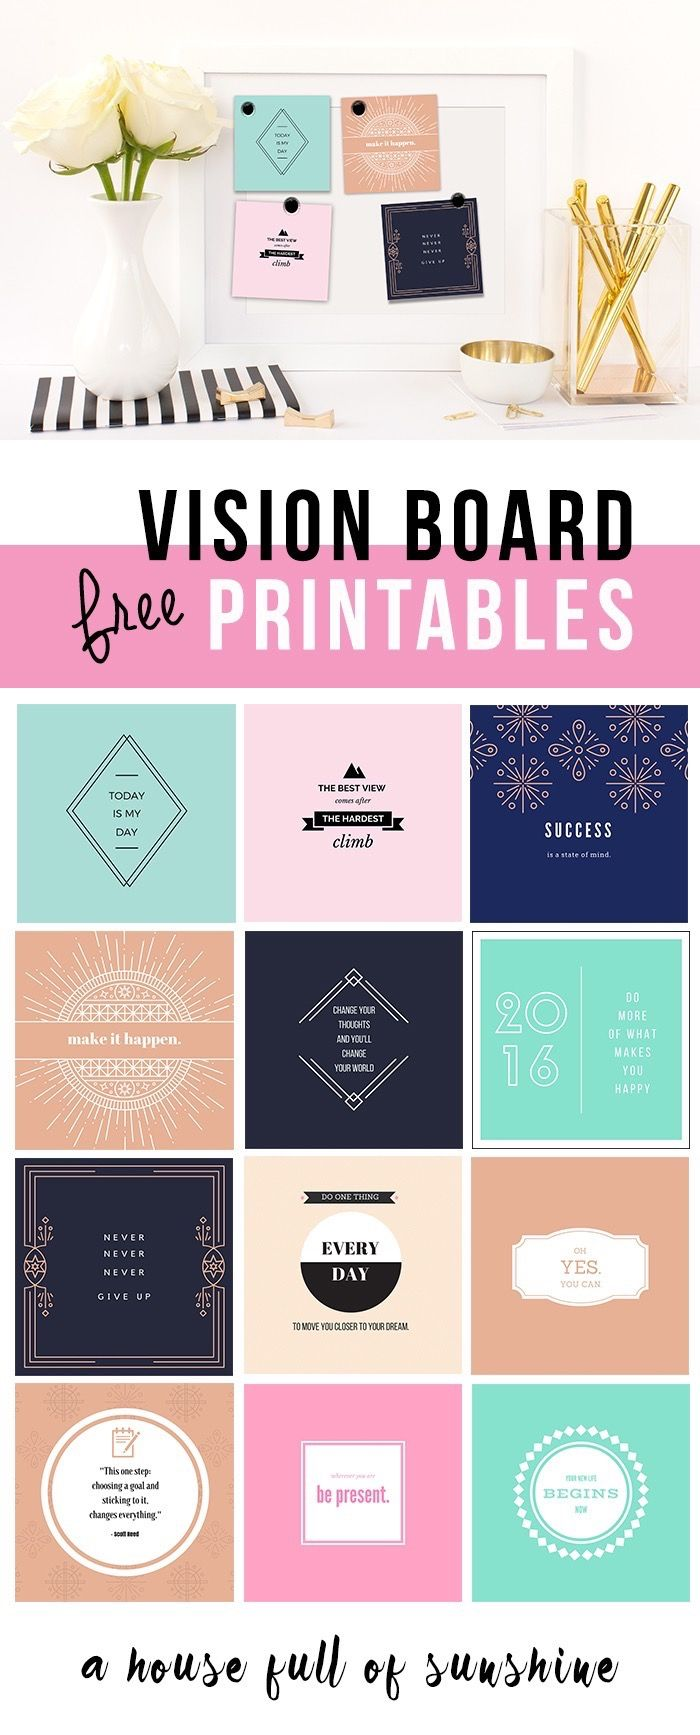 Free Vision Board Printables #247moms